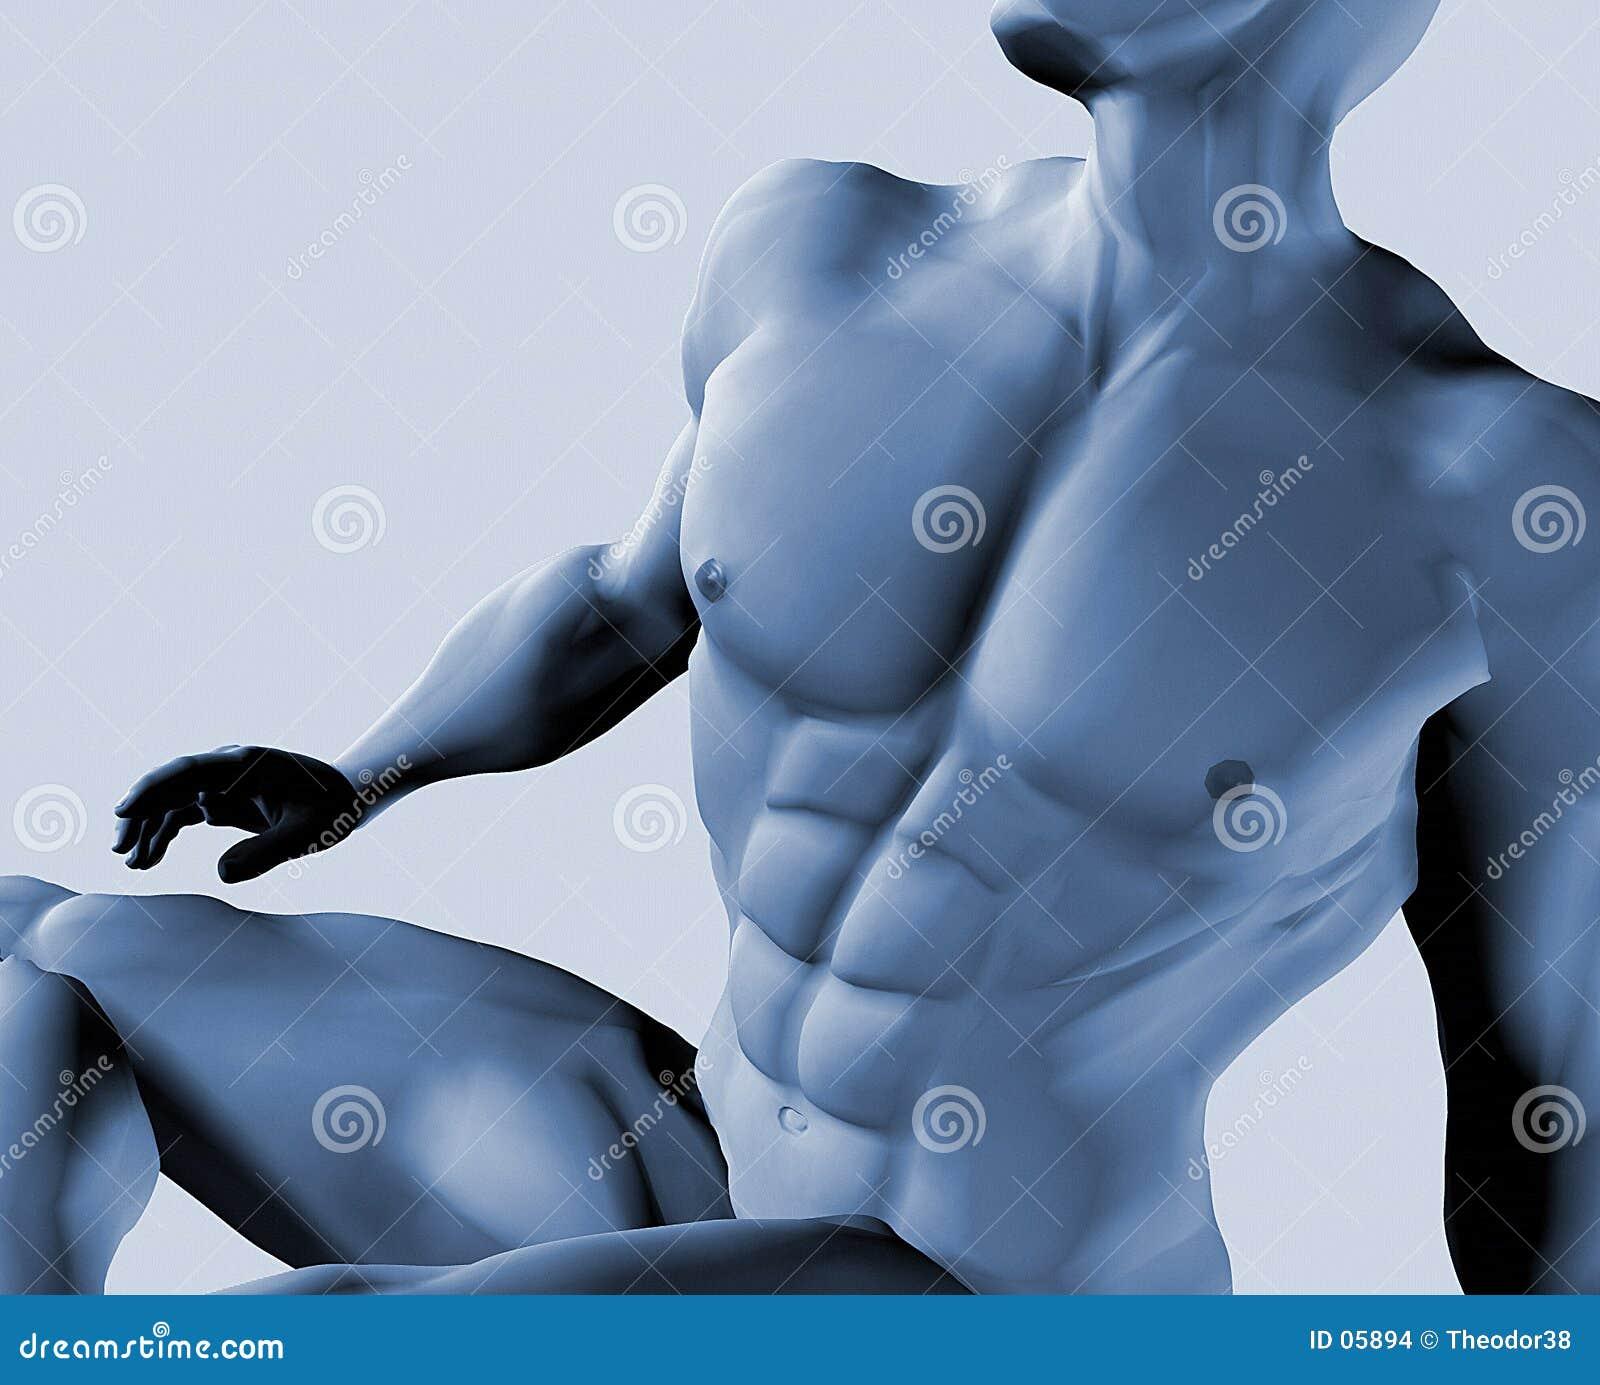 Varón desnudo